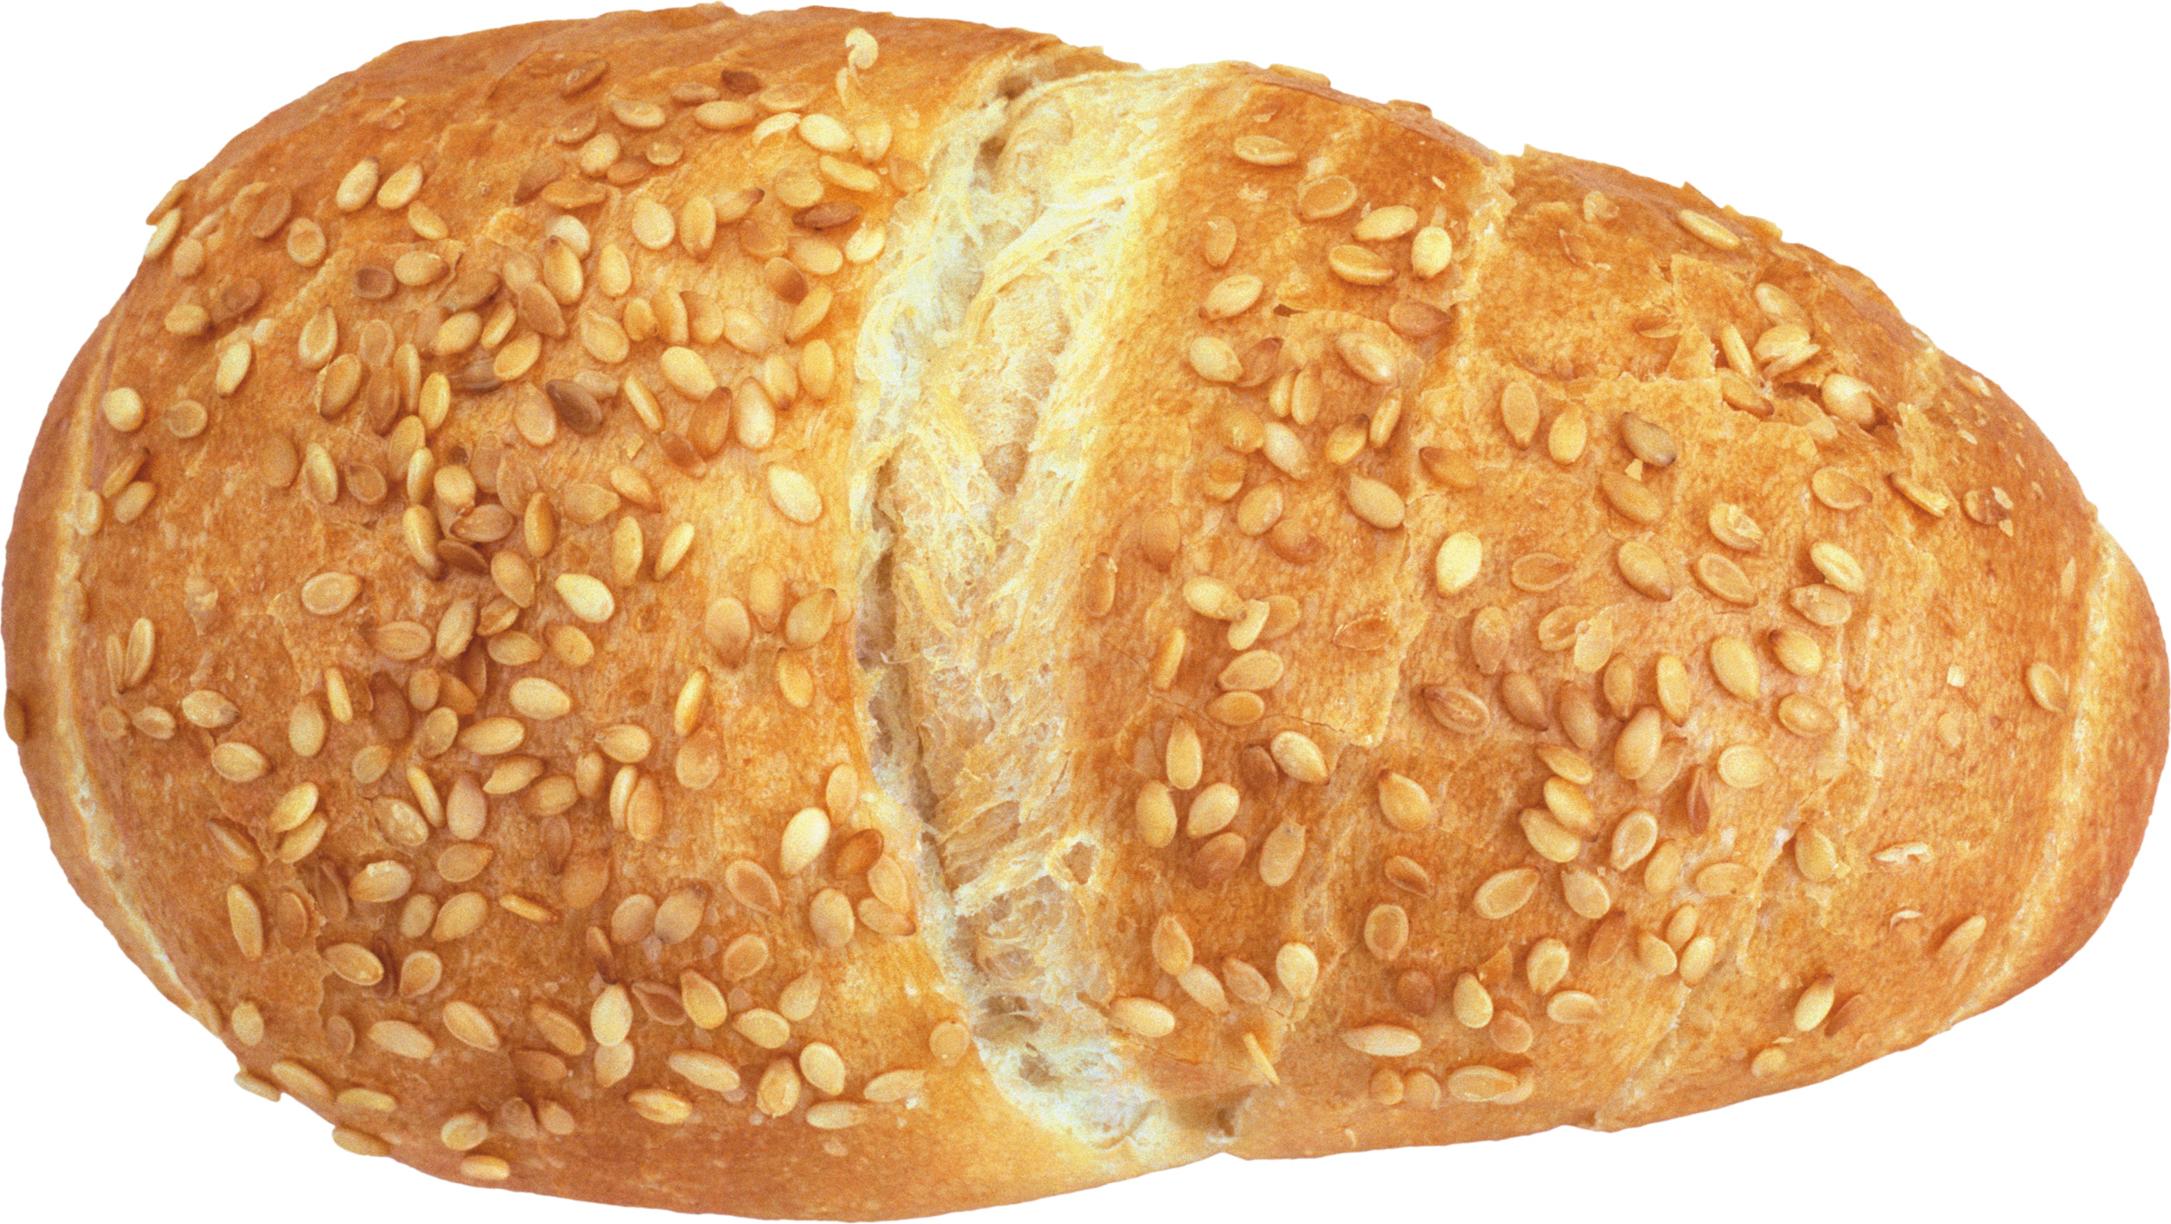 Croissant Bread PNG Image